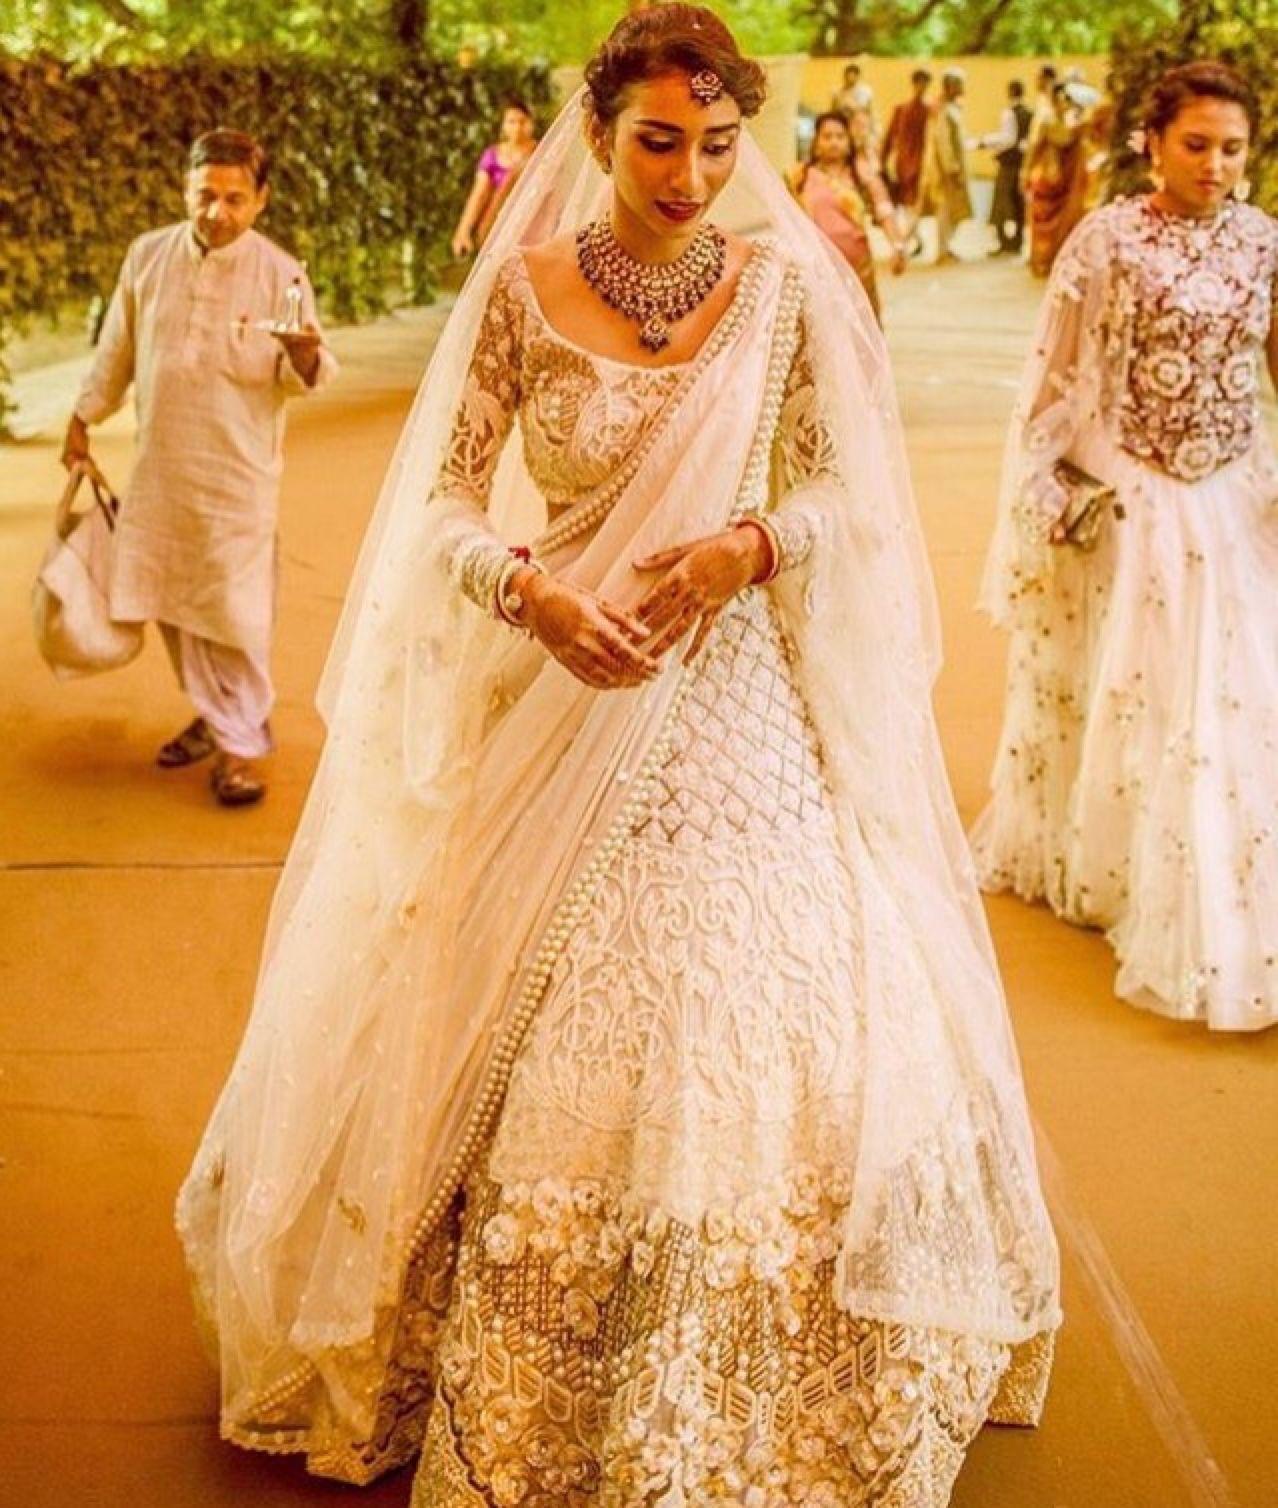 Punjabi Weddings (With Images)